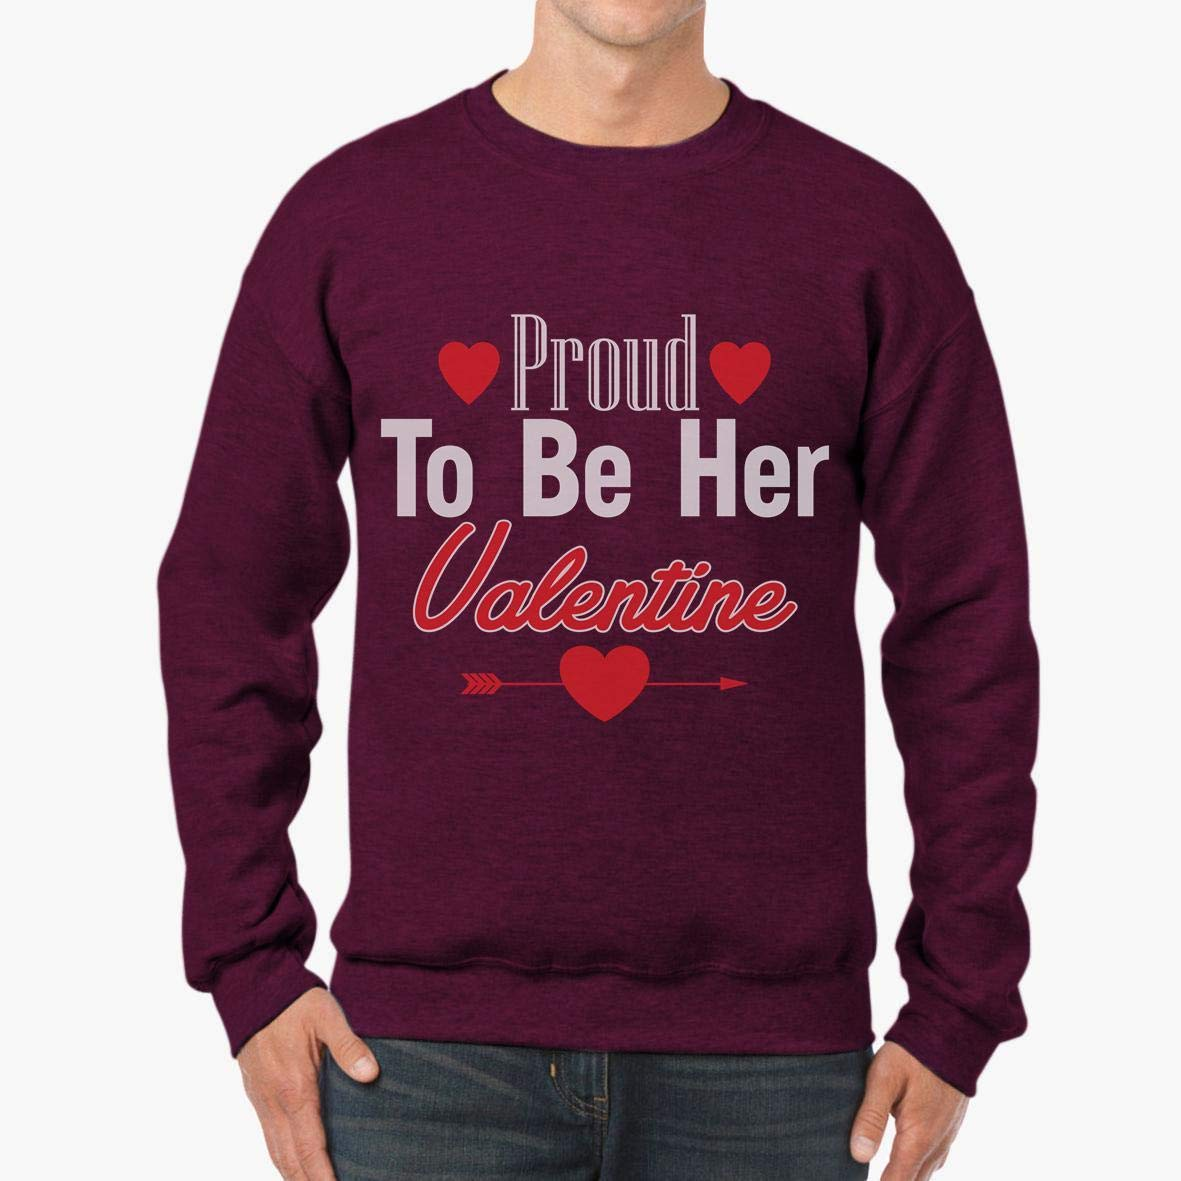 tee Doryti Proud to Be Her Valentine Valentines Day Couples Unisex Sweatshirt